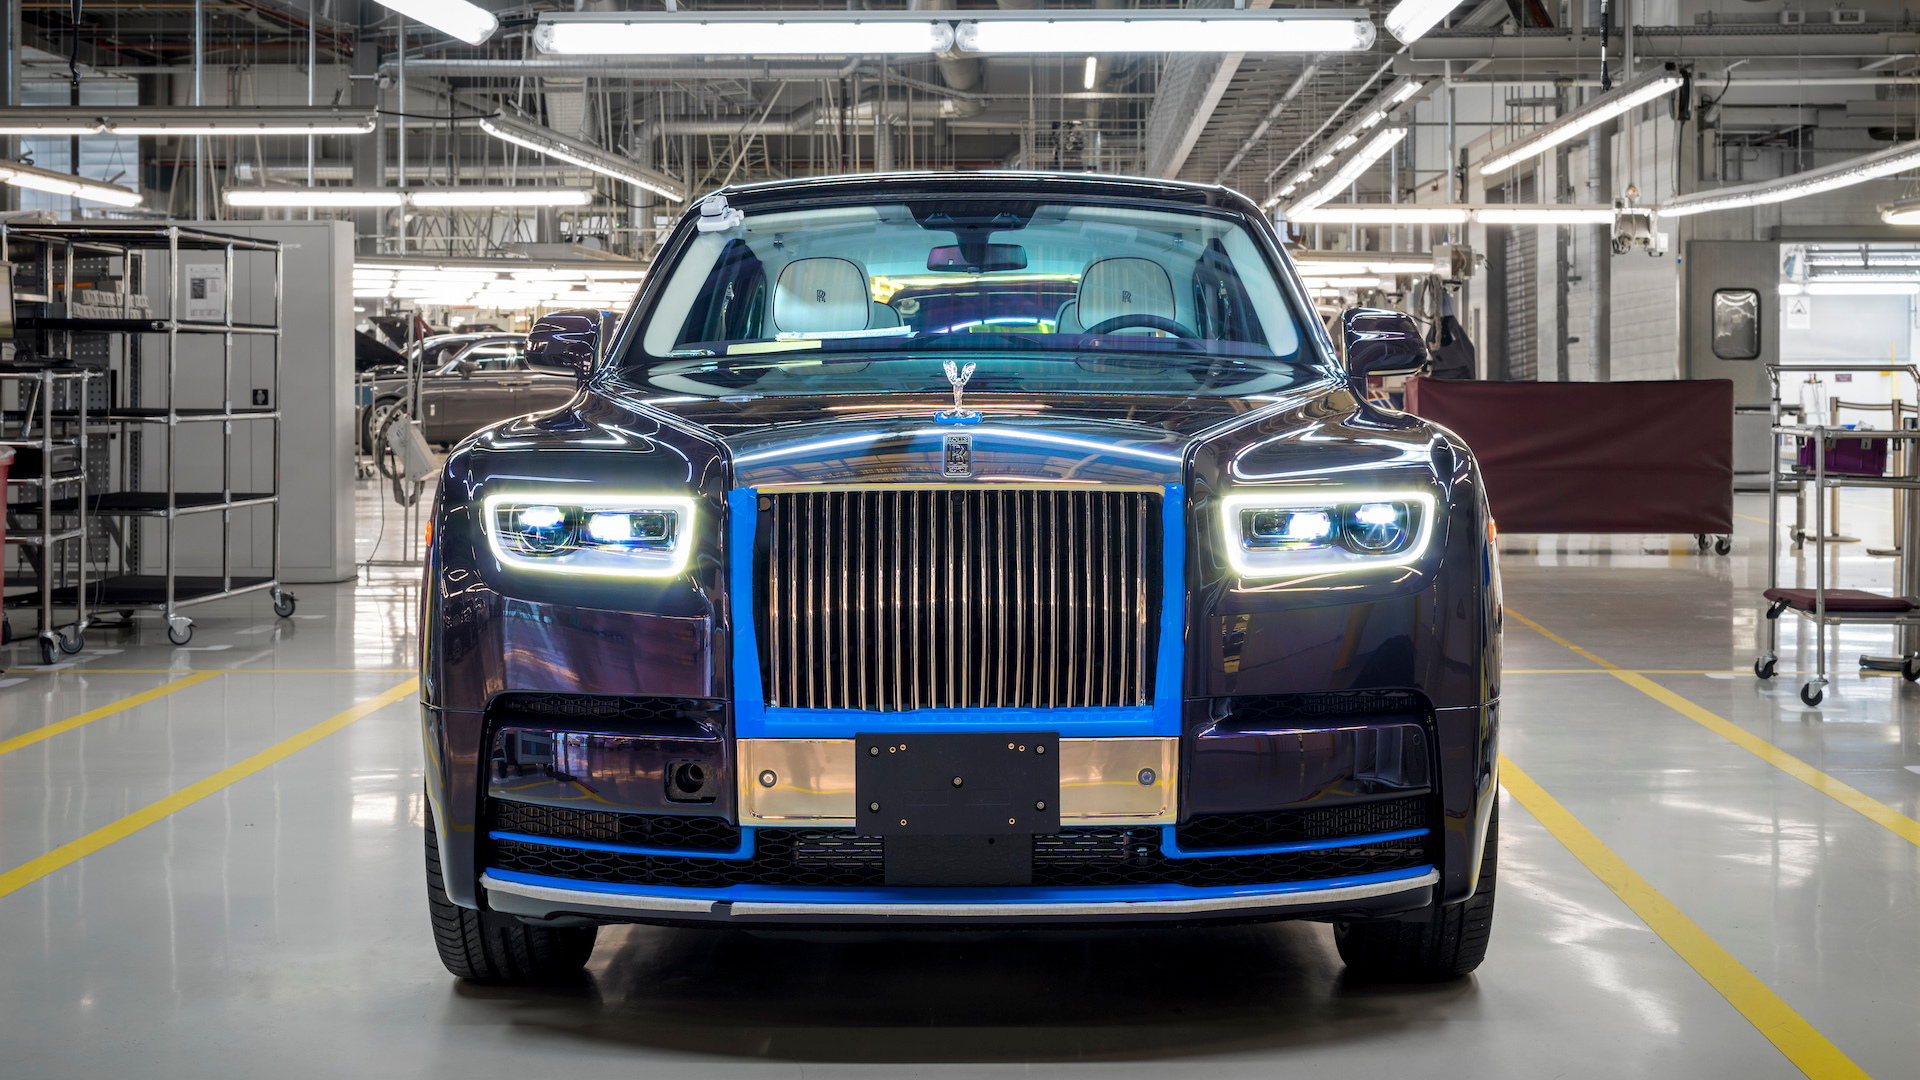 First 2018 Rolls-Royce Phantom heading to auction